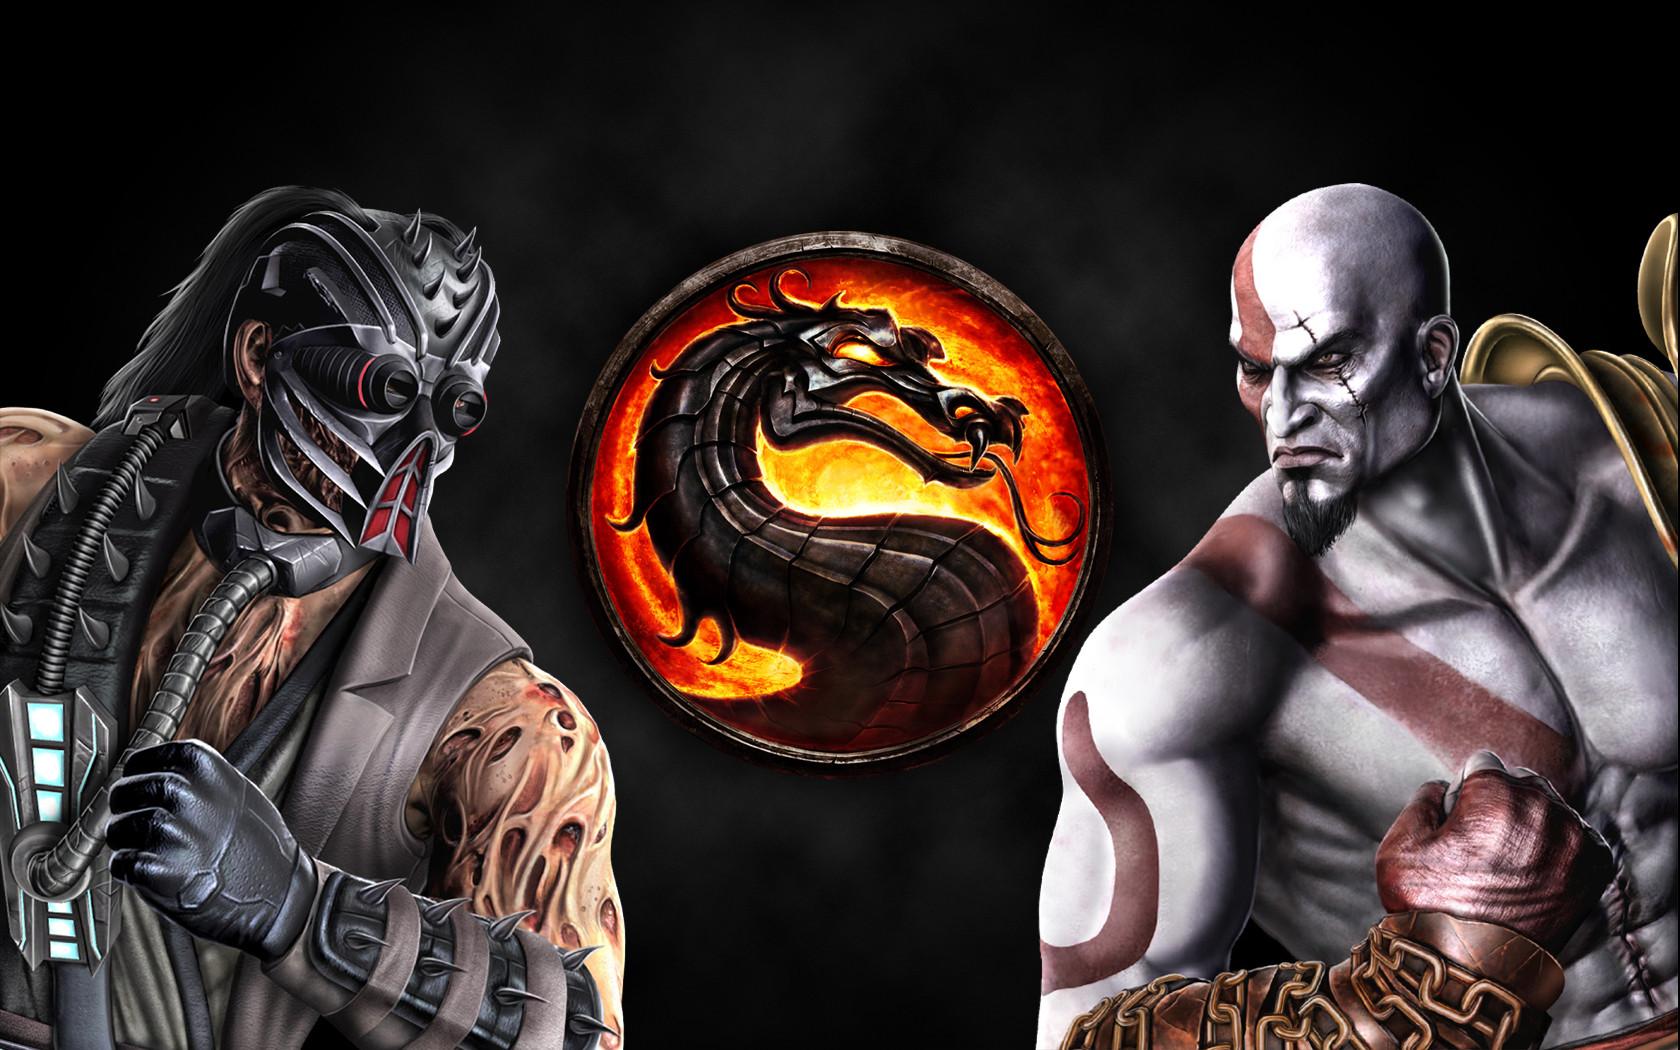 Mortal Kombat 9 Kabal vs Kratos by Nicolae1013 on DeviantArt